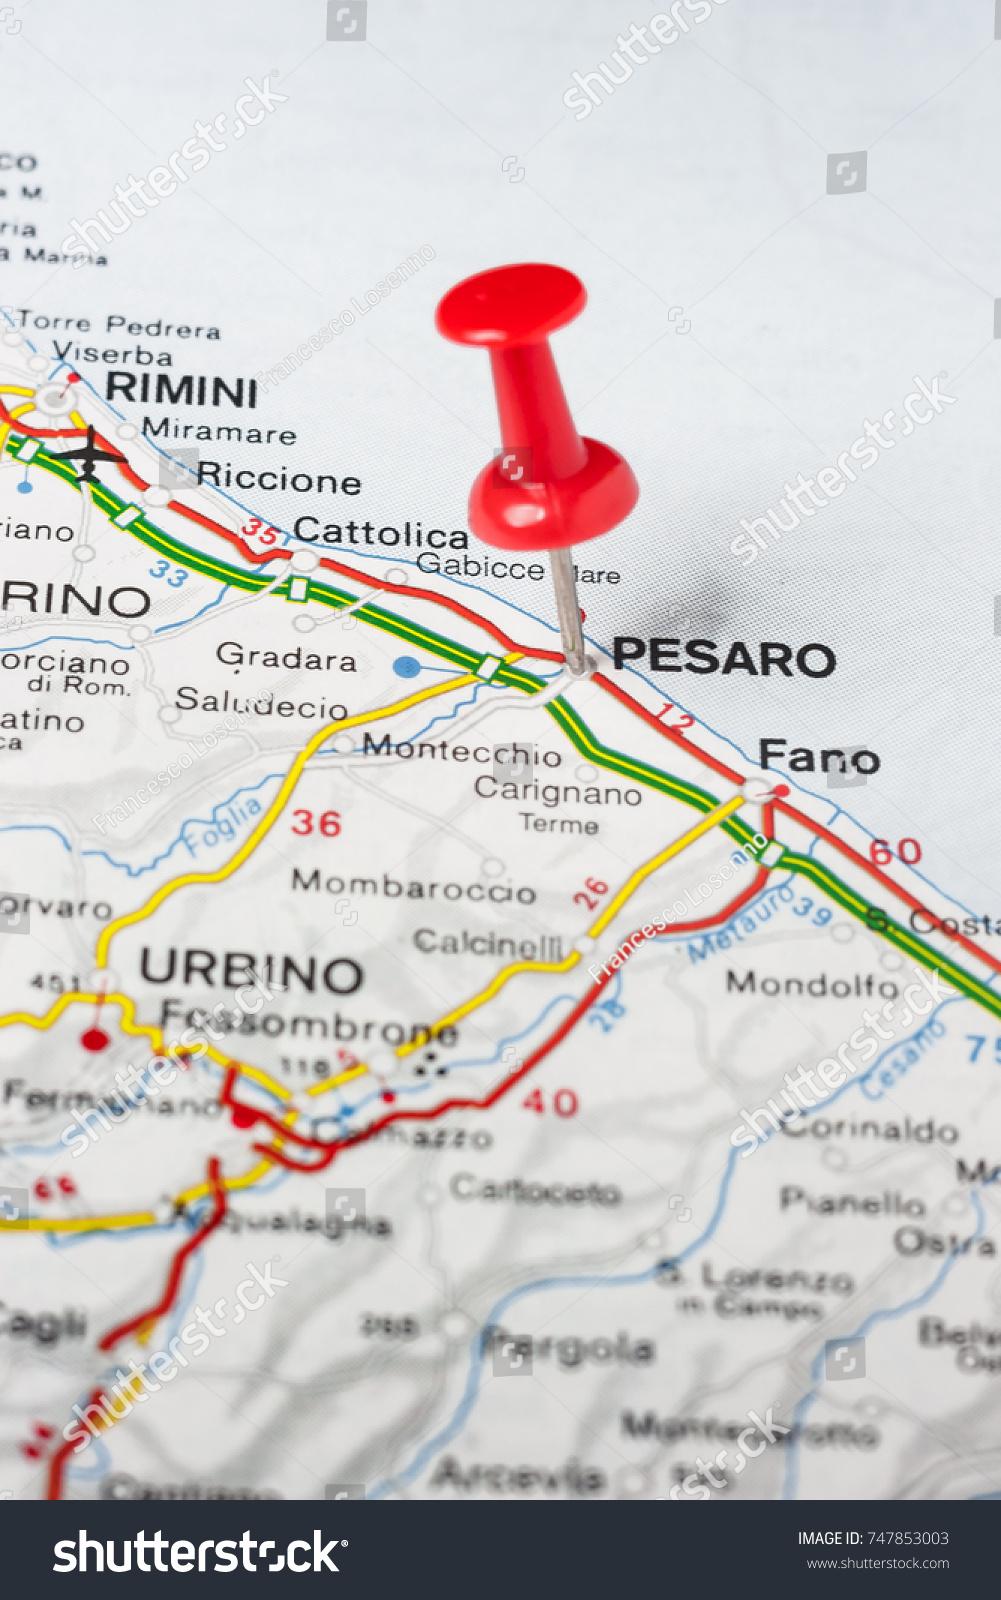 Road Map City Pesaro Italy Stock Photo Edit Now 747853003